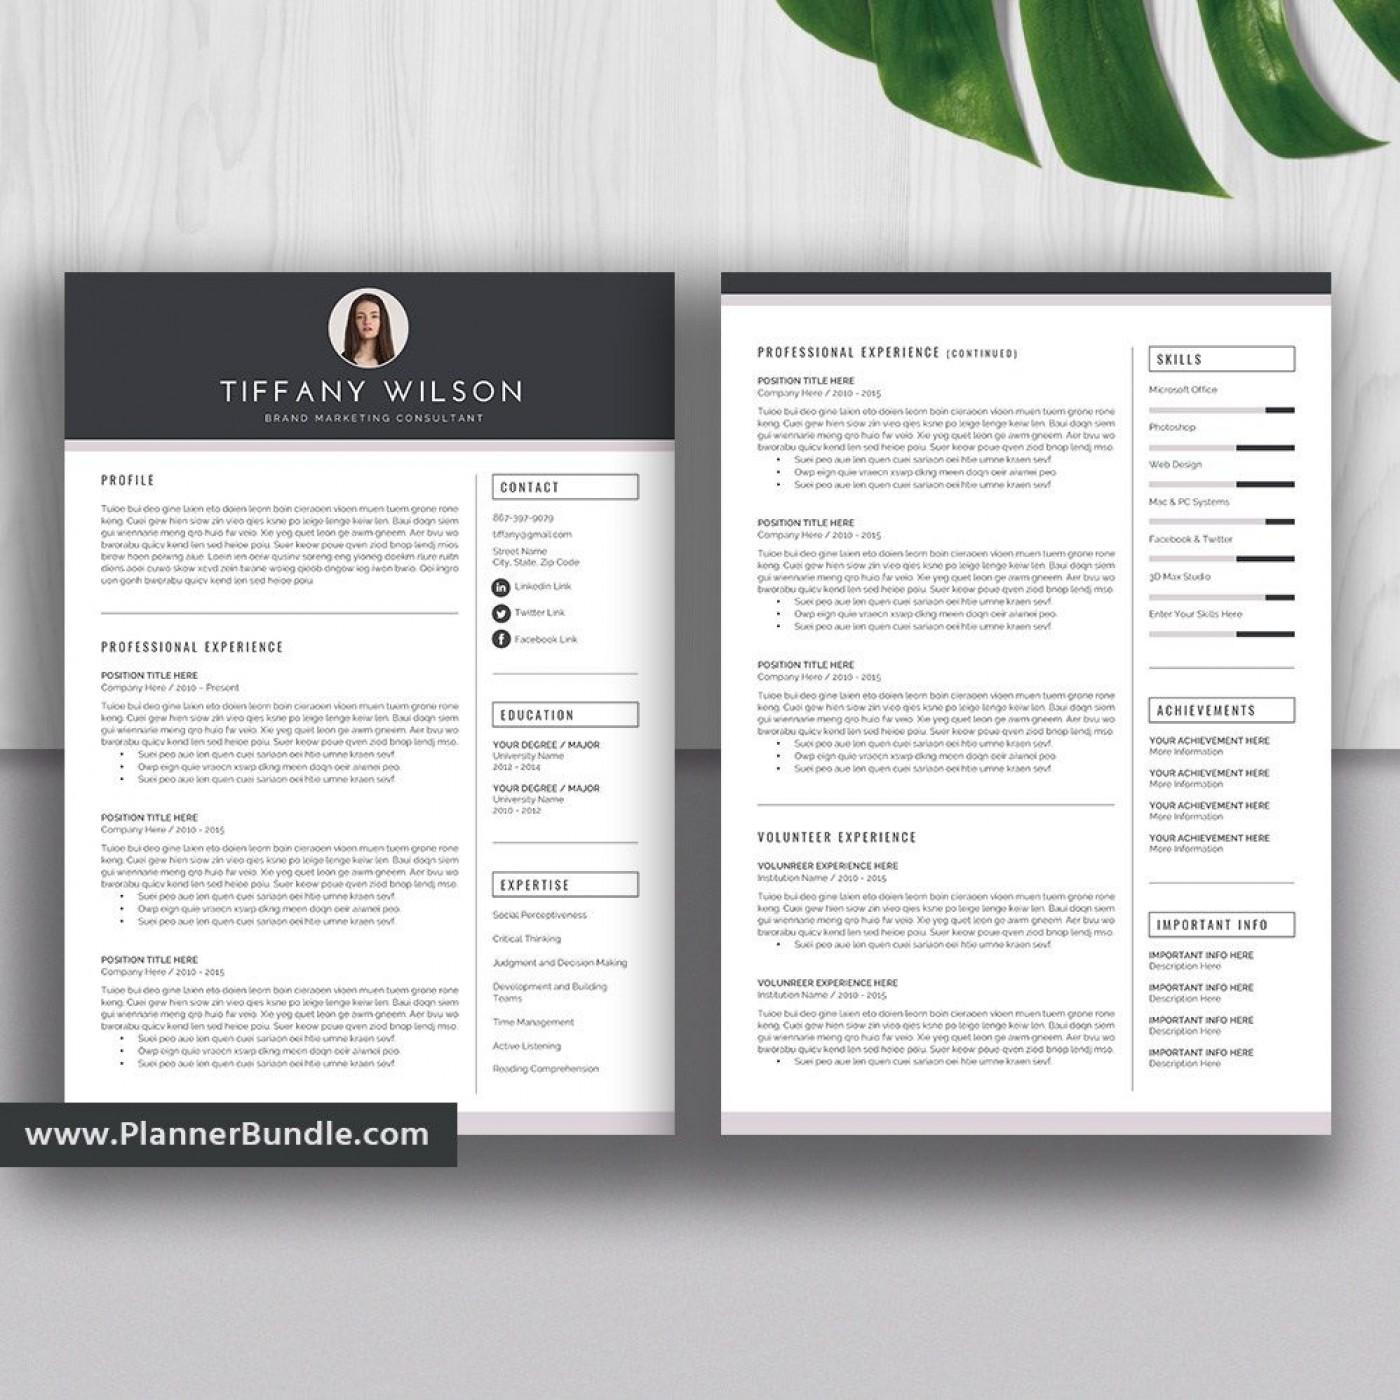 008 Marvelou Graduate School Resume Template Word Image  High Microsoft1400